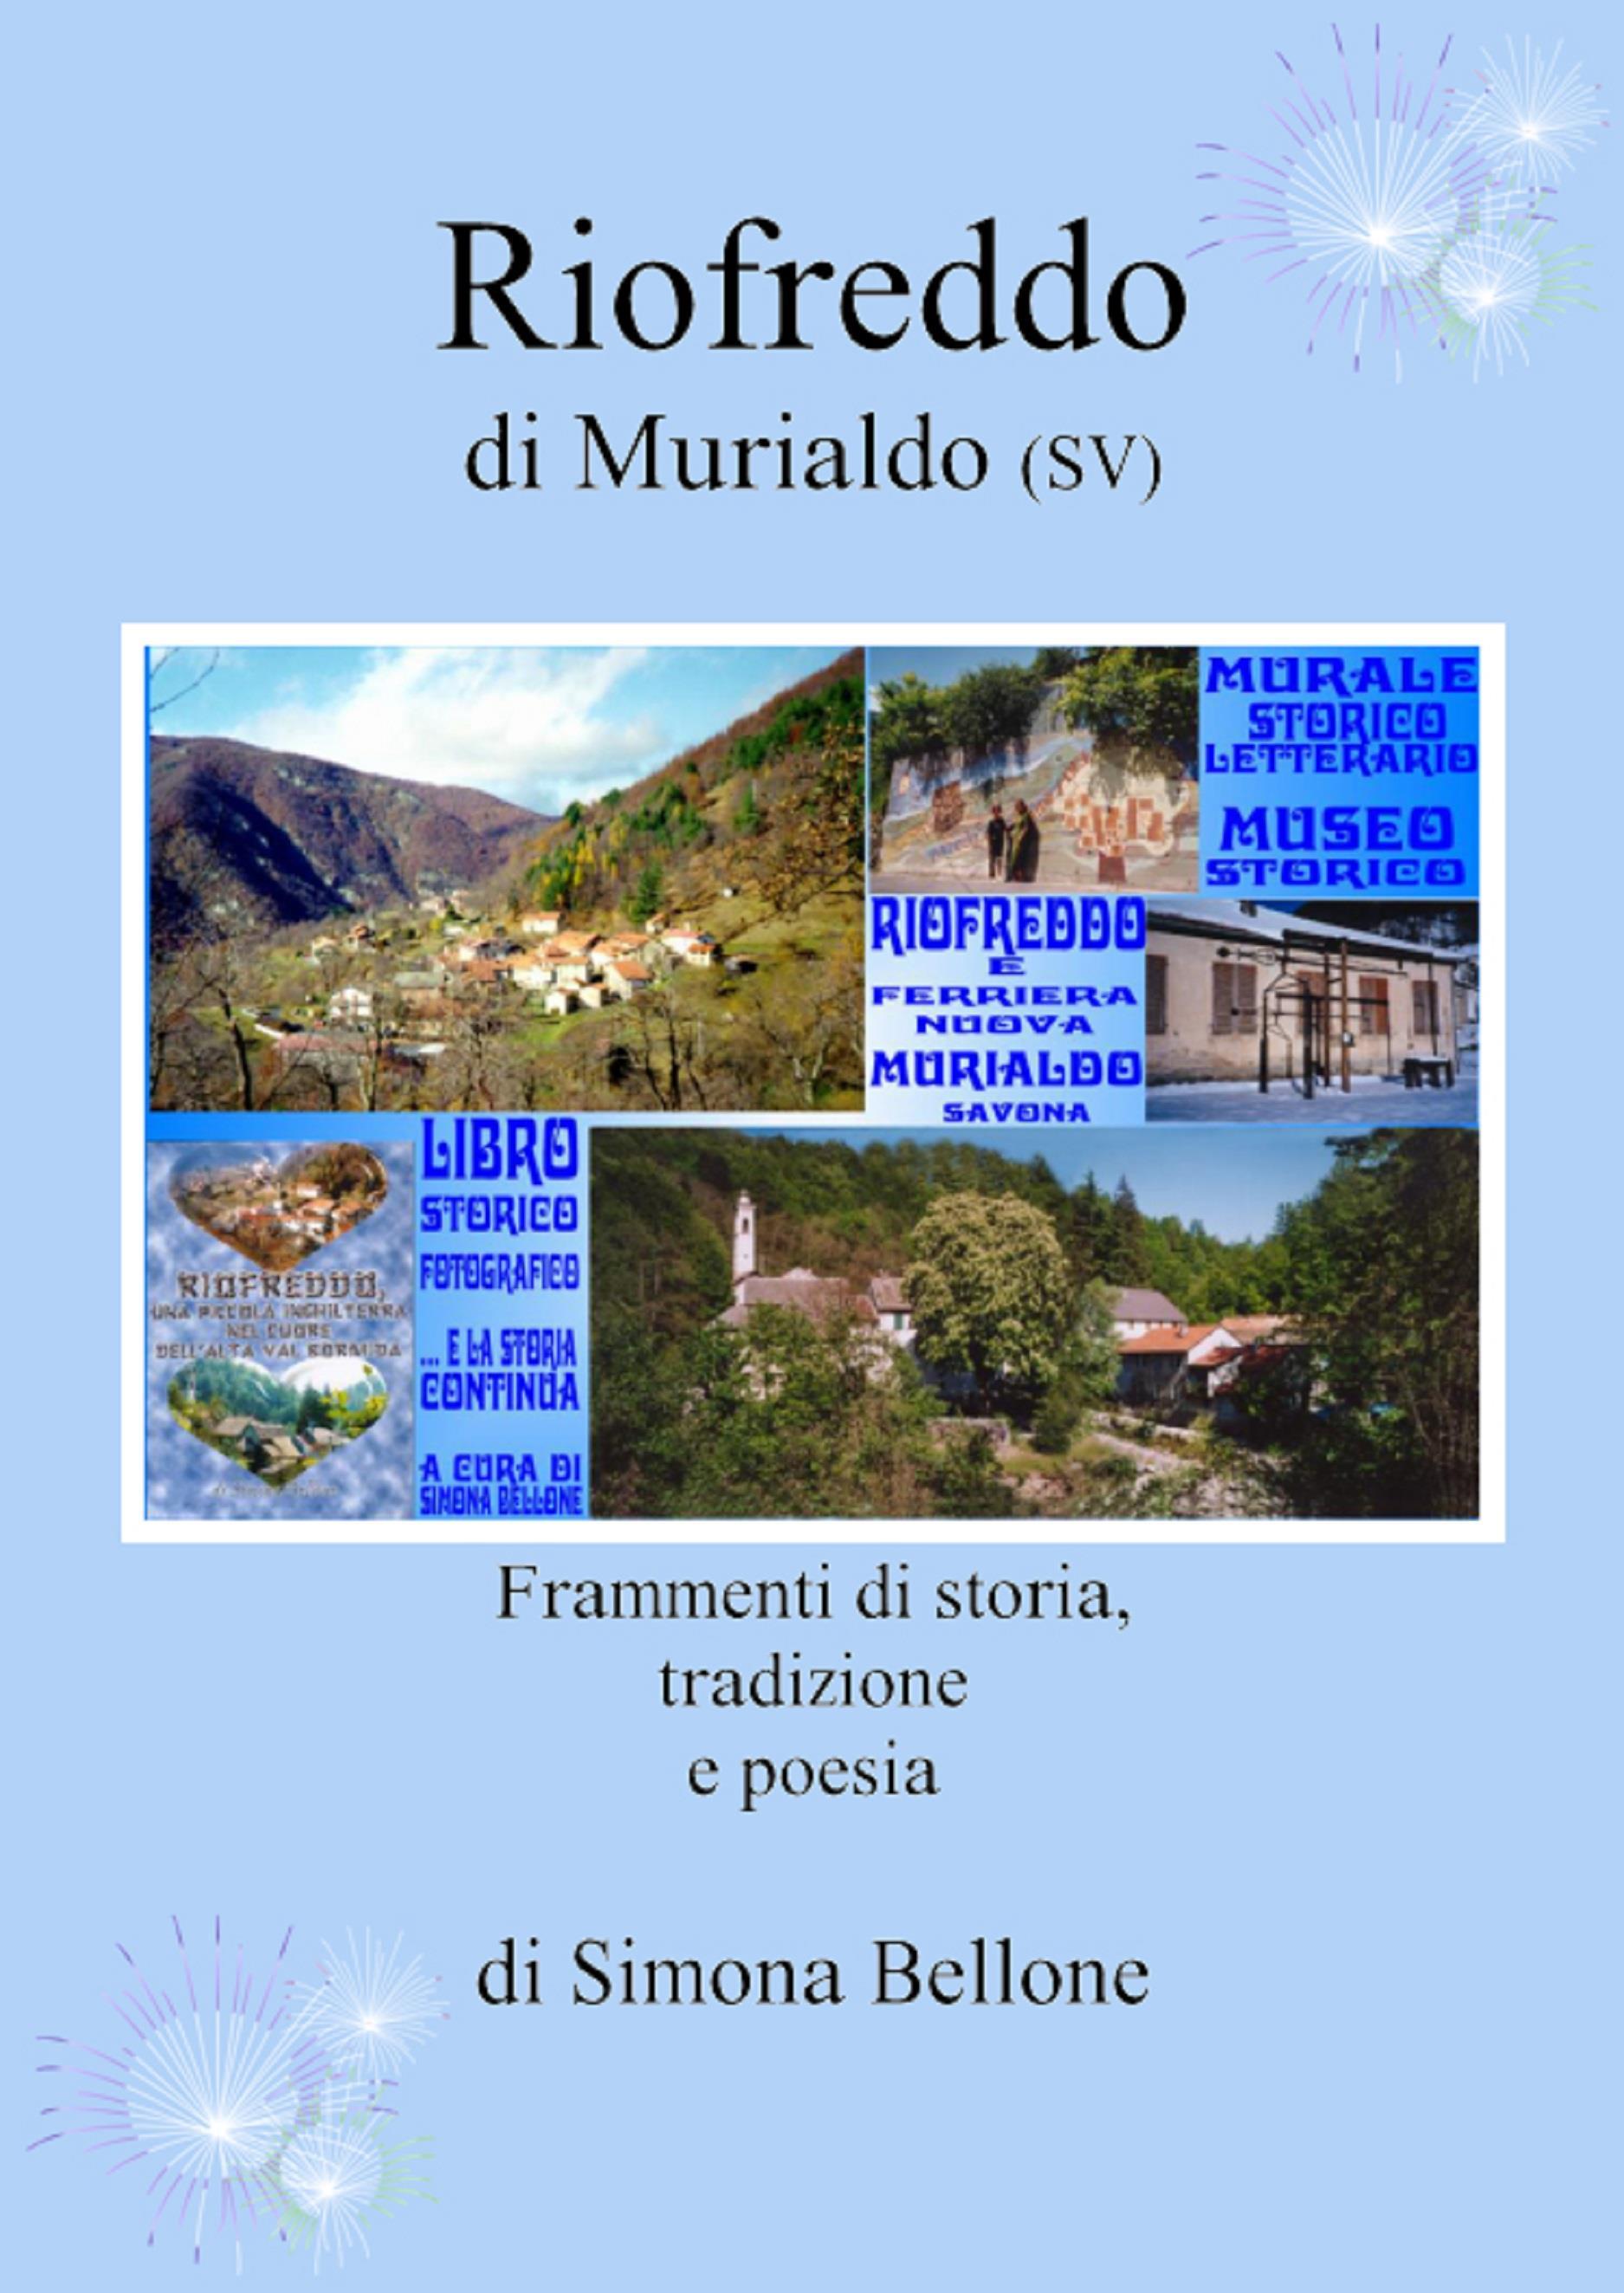 Riofreddo di Murialdo (SV)